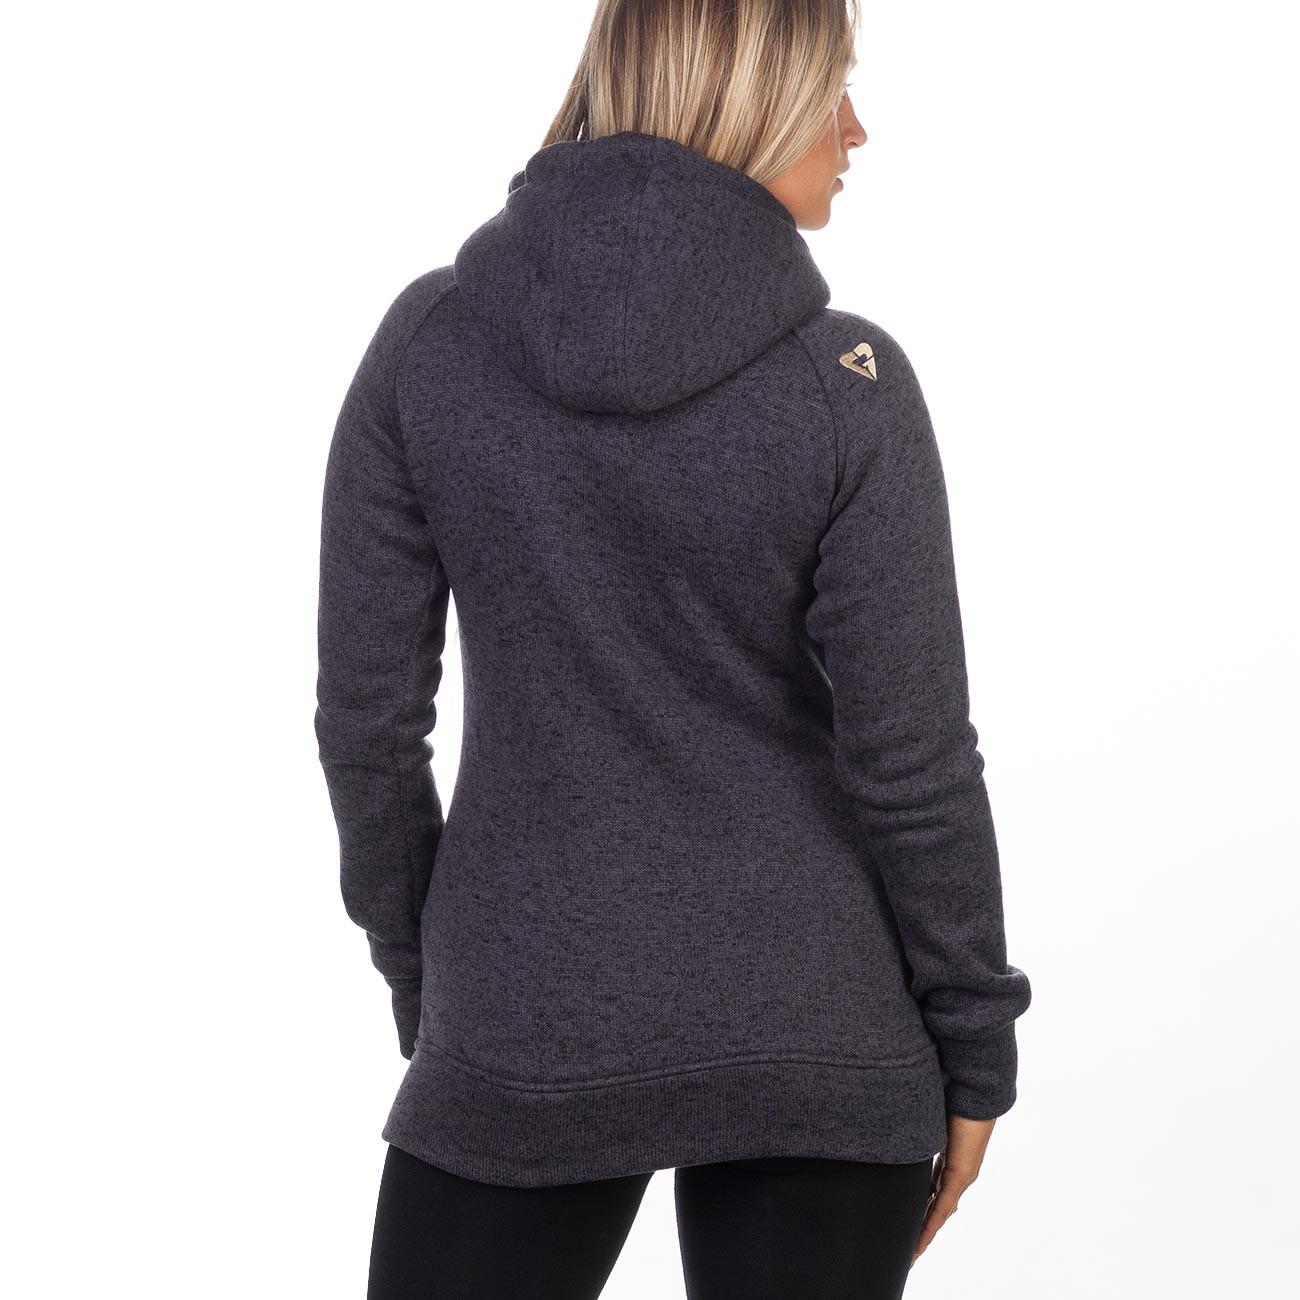 d1383a8540 Technická mikina Gravity Lola Sweater black heather